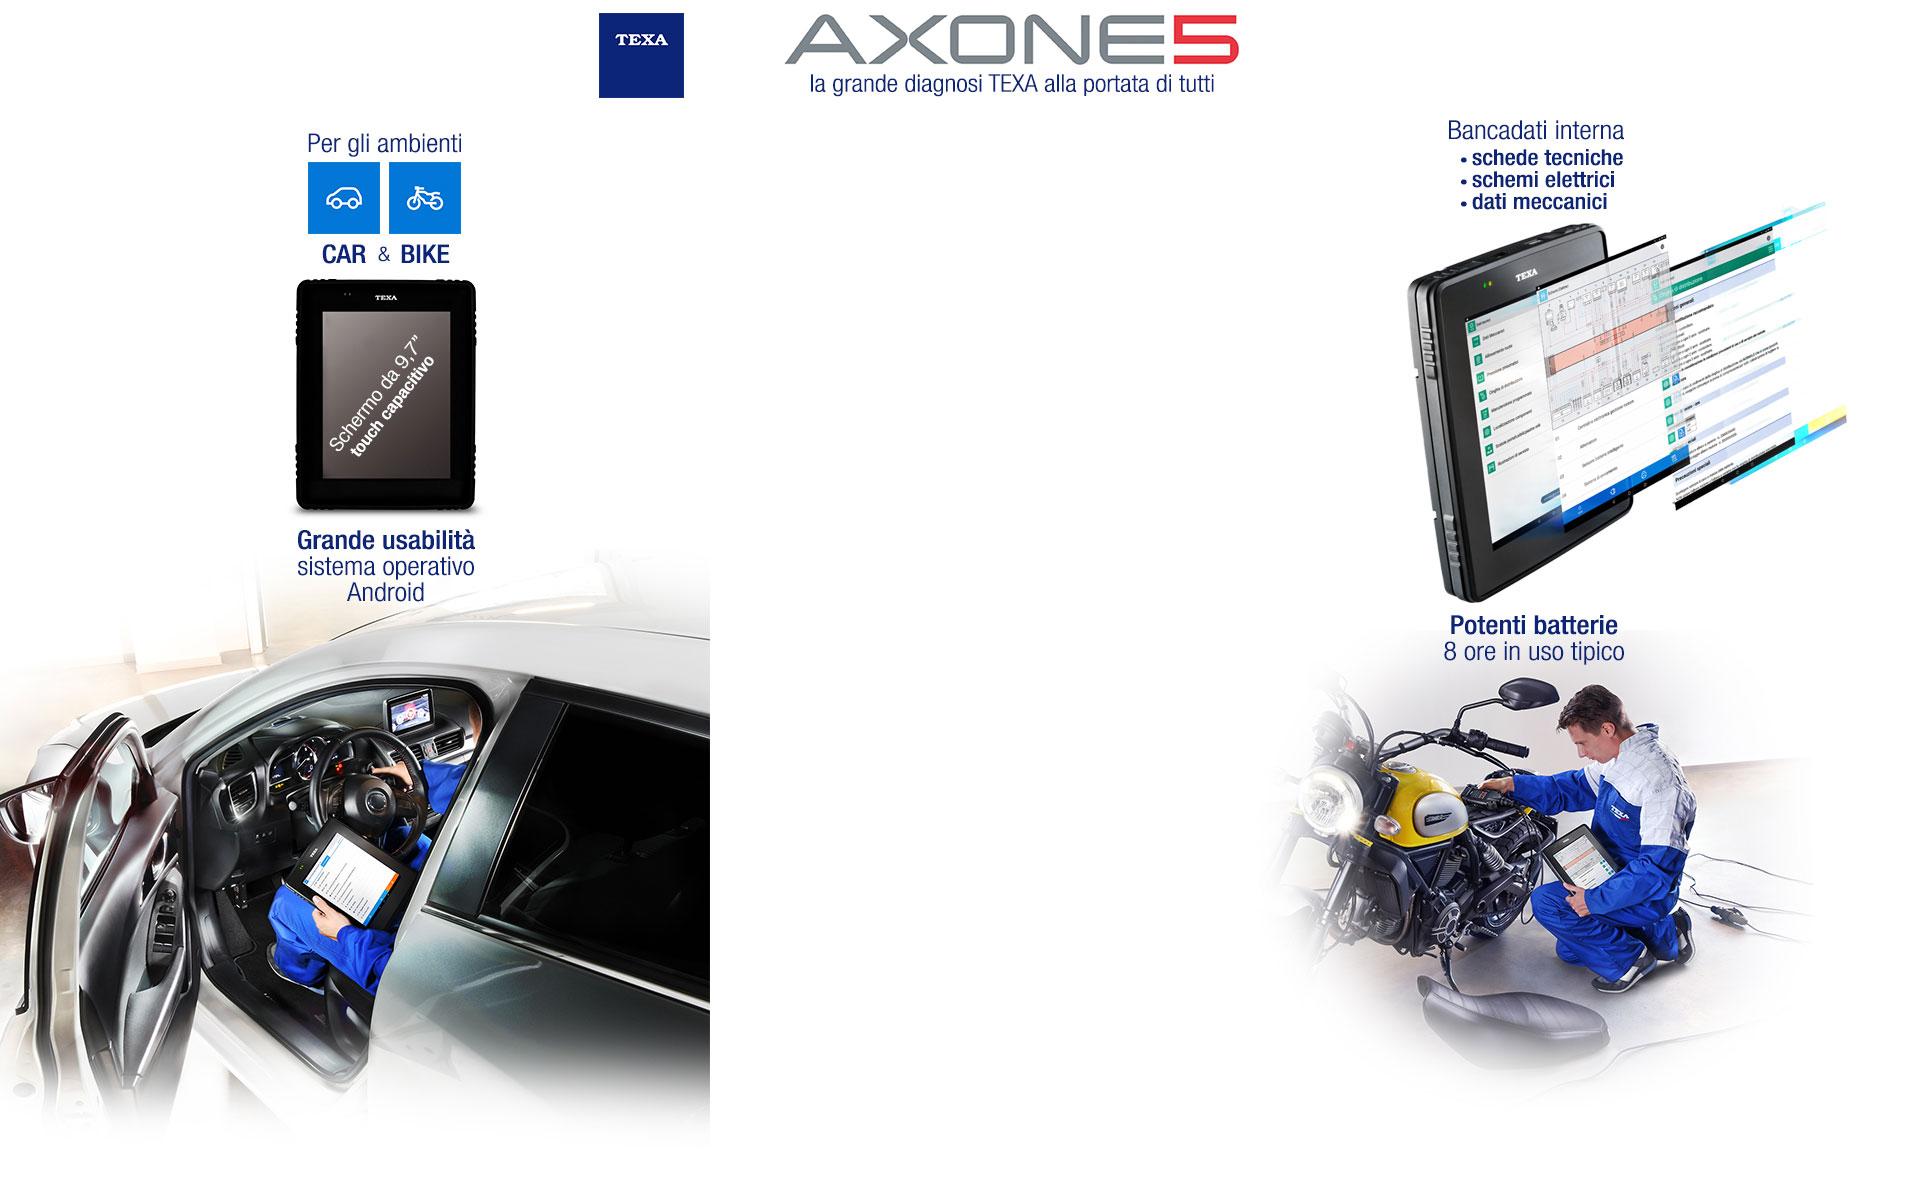 Nuovo Strumento Diagnosi TEXA AXONE5